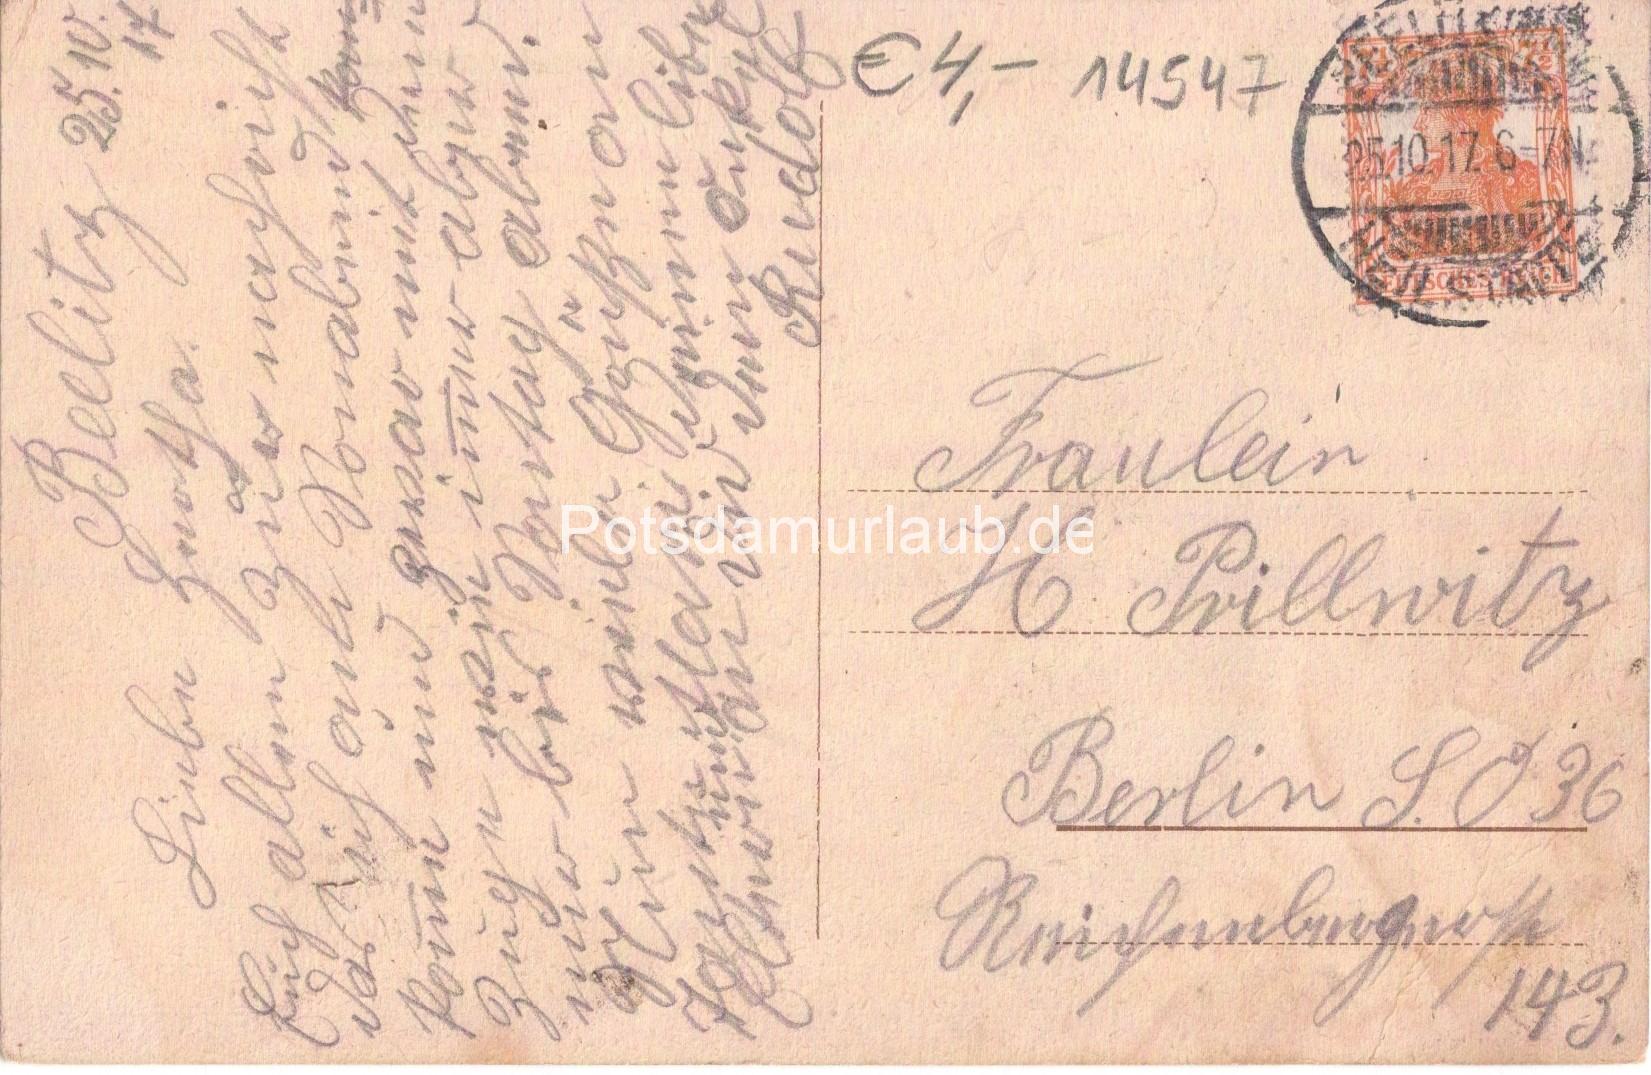 1917 10 25